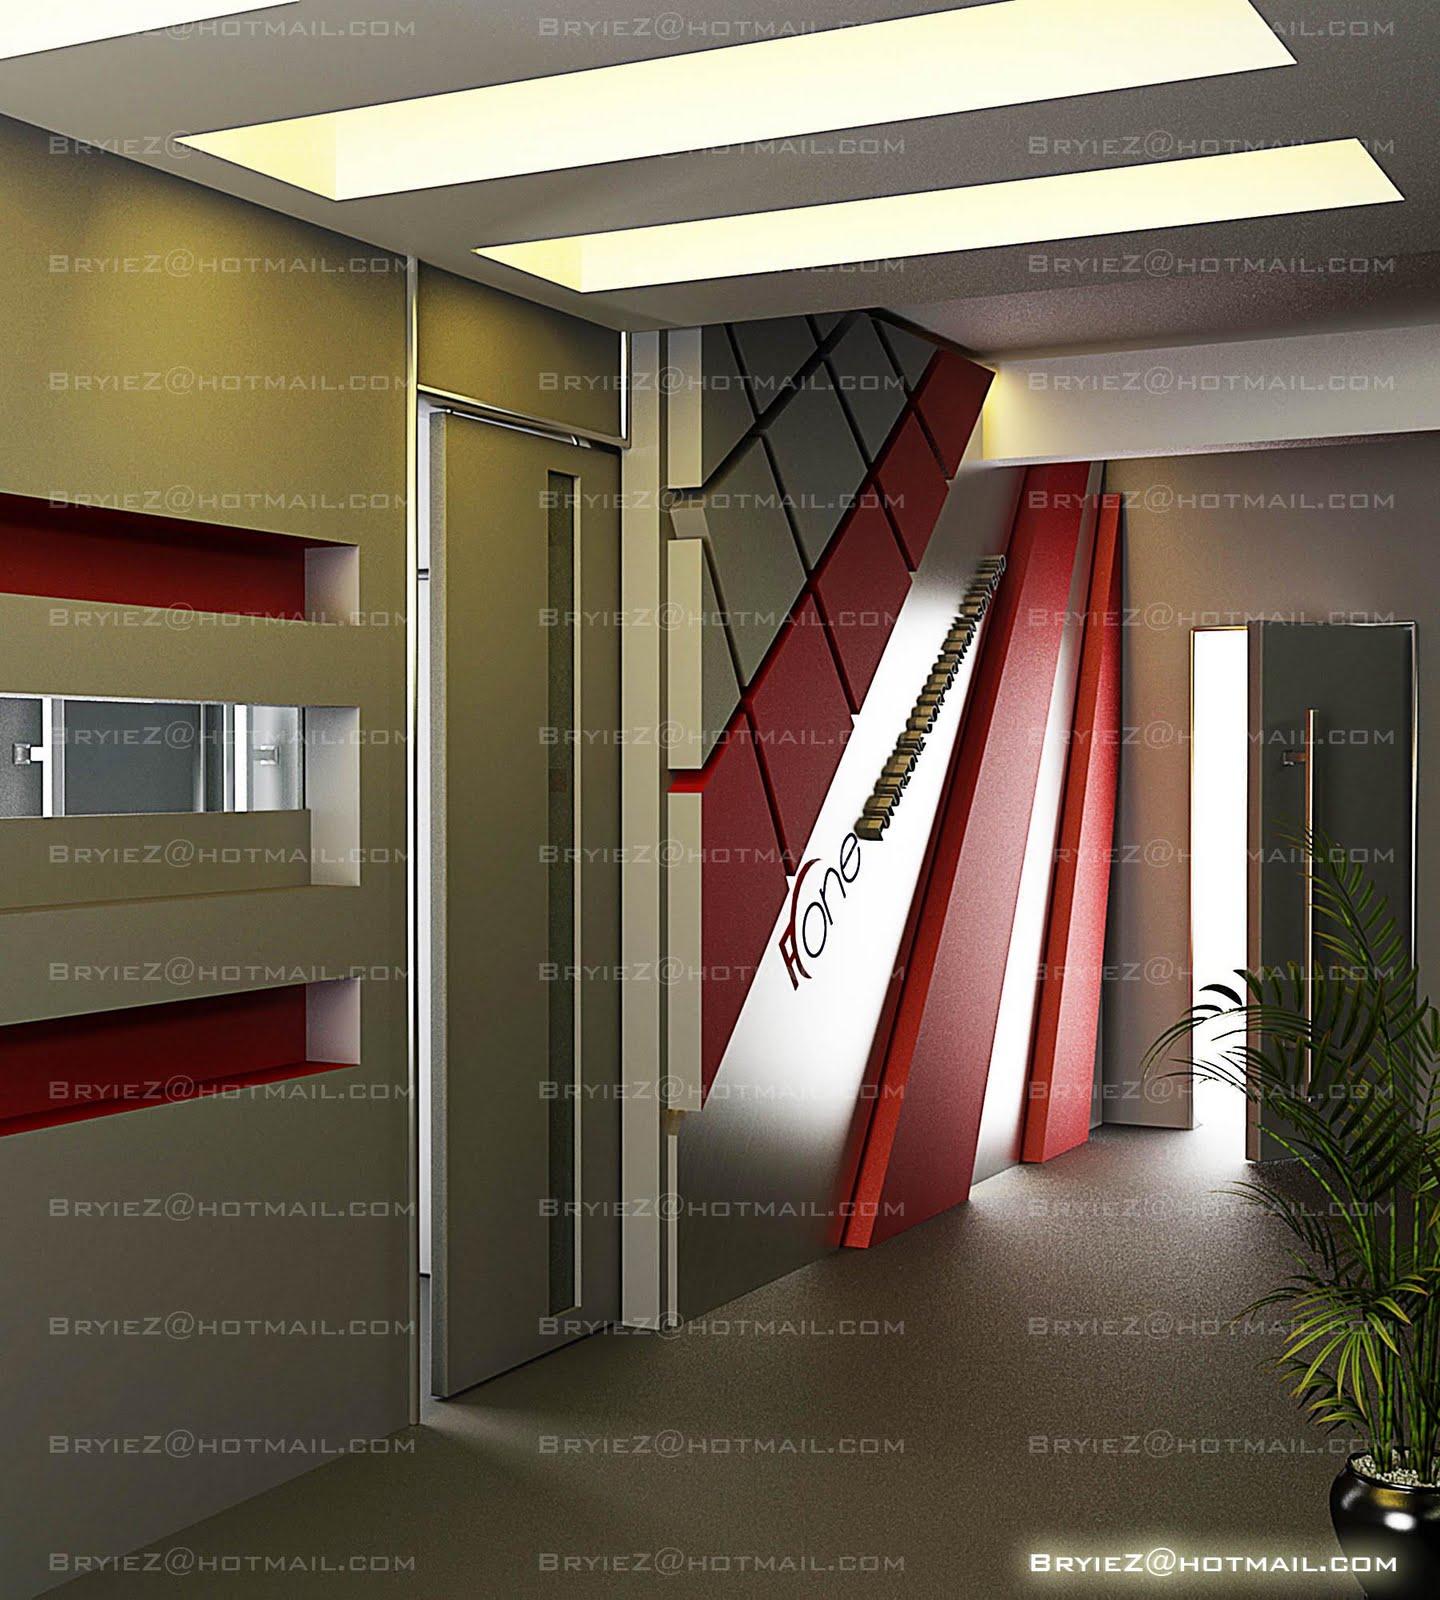 Bryiez Interior Space Design Office Entrance